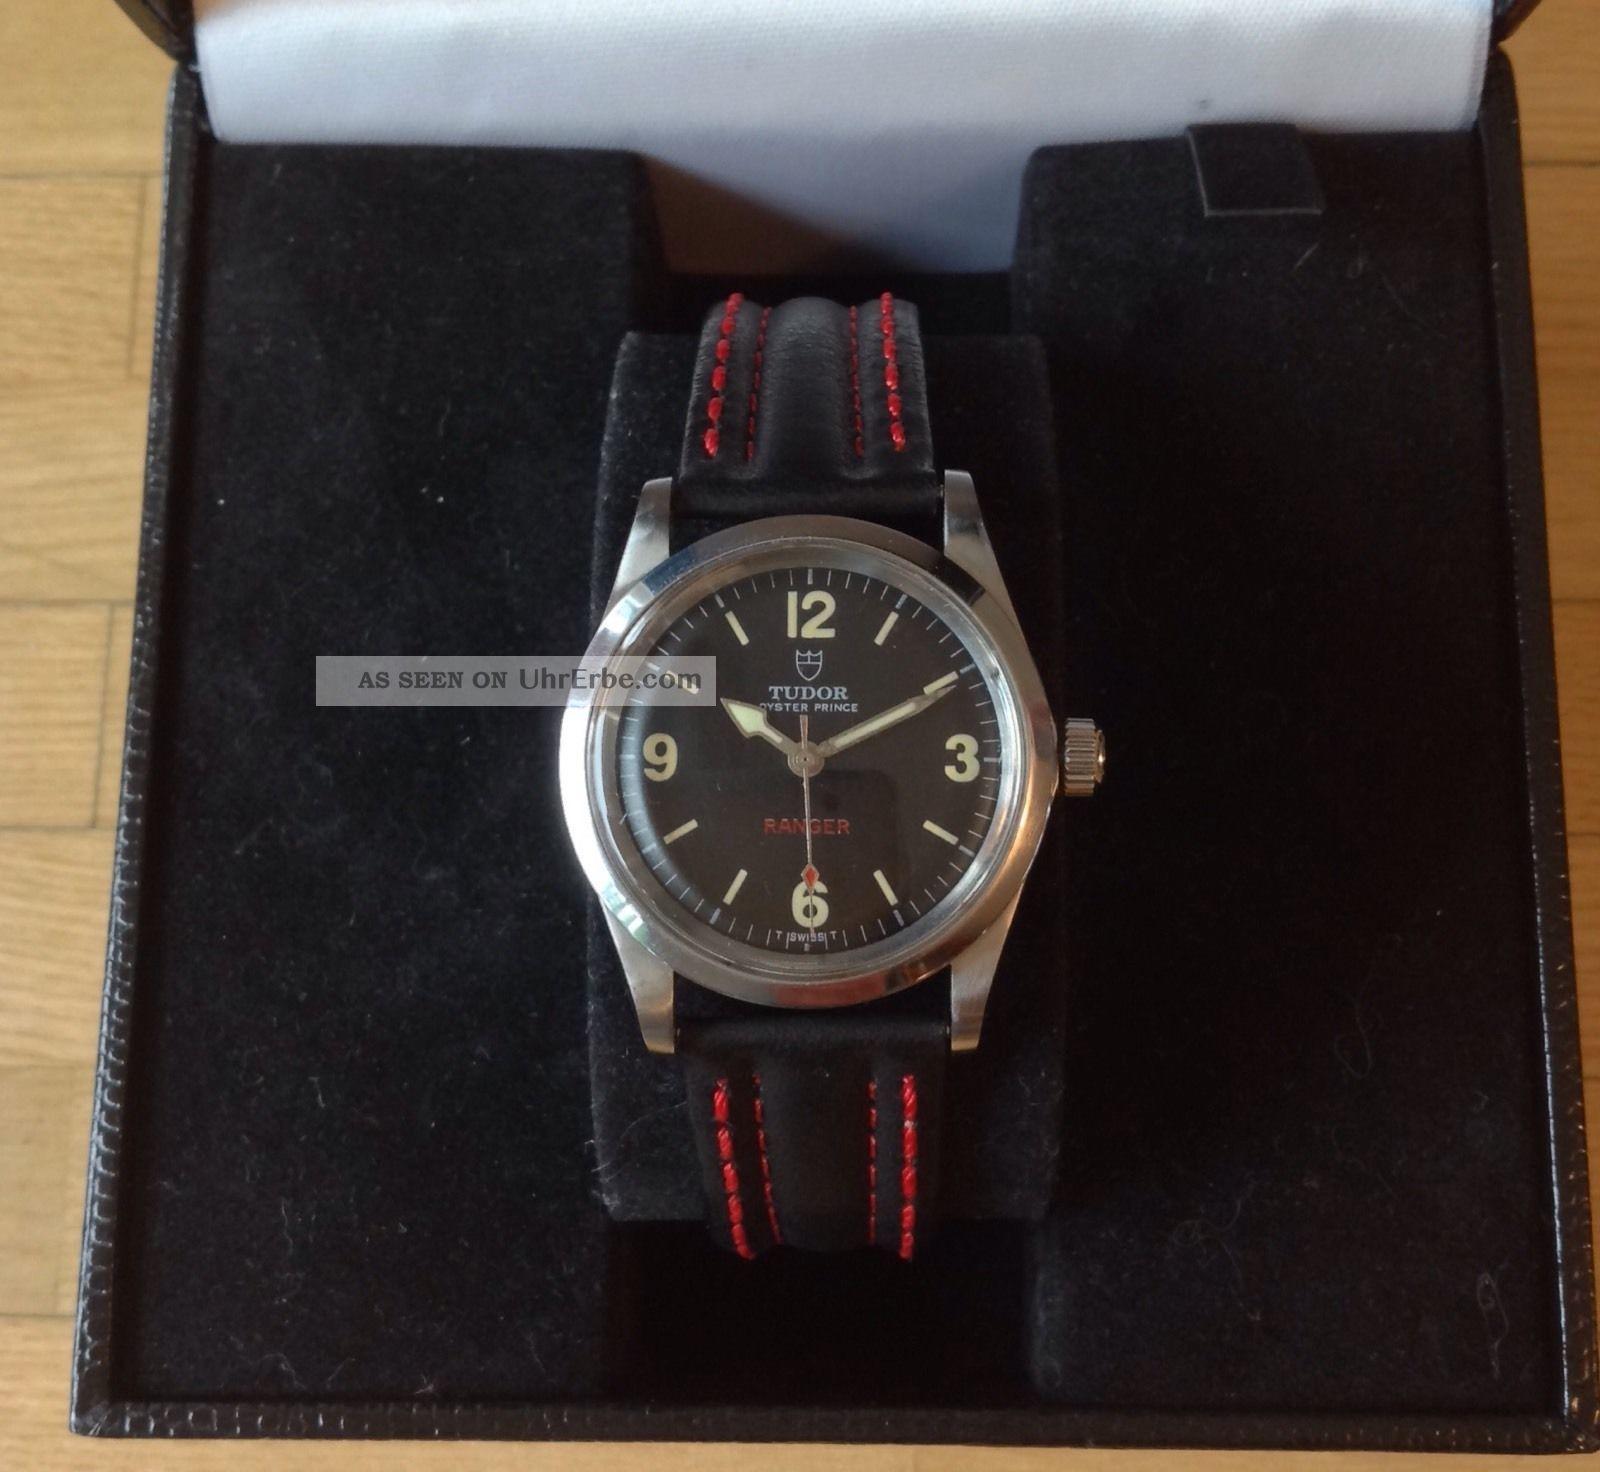 Tudor Oyster - Prince Ranger Automatic Armbanduhr,  Typ 9050 Armbanduhren Bild